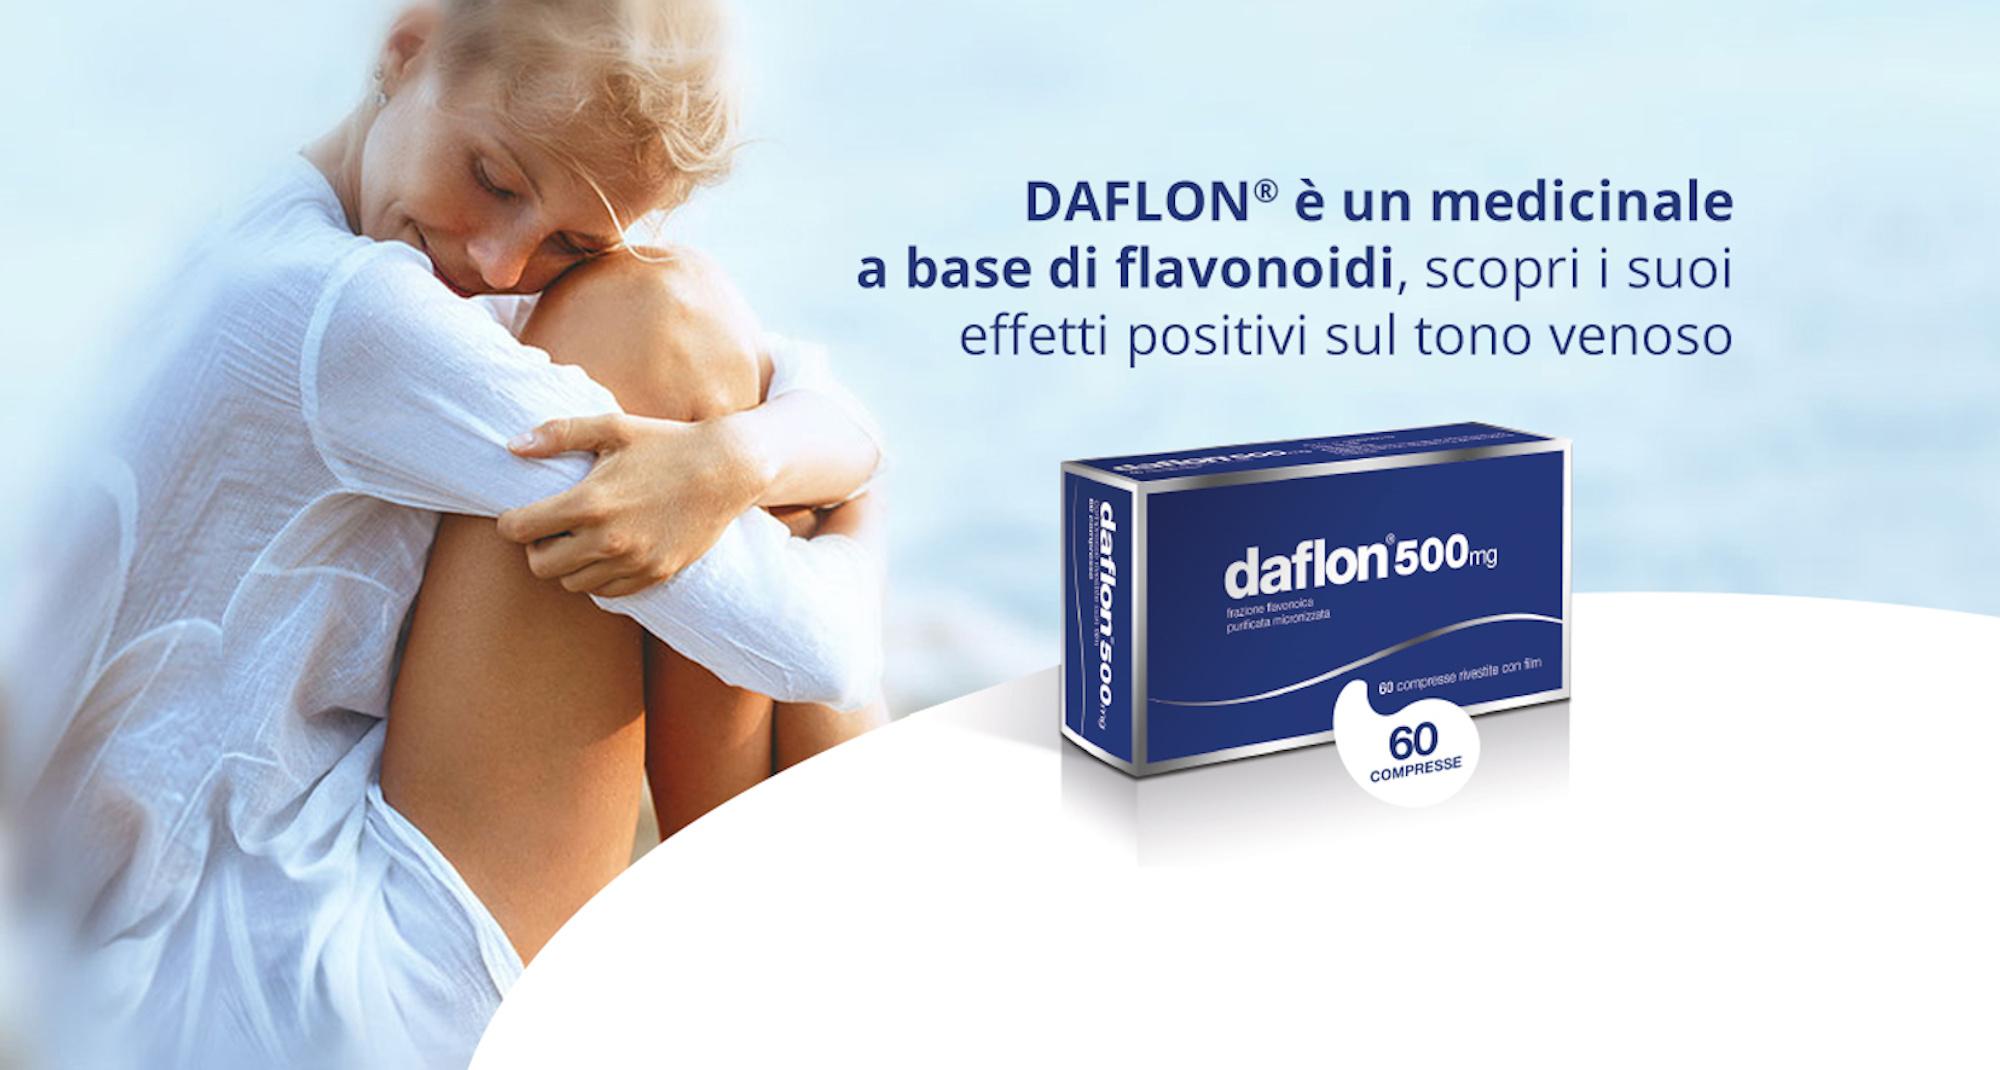 daflon-insufficienza-venosa